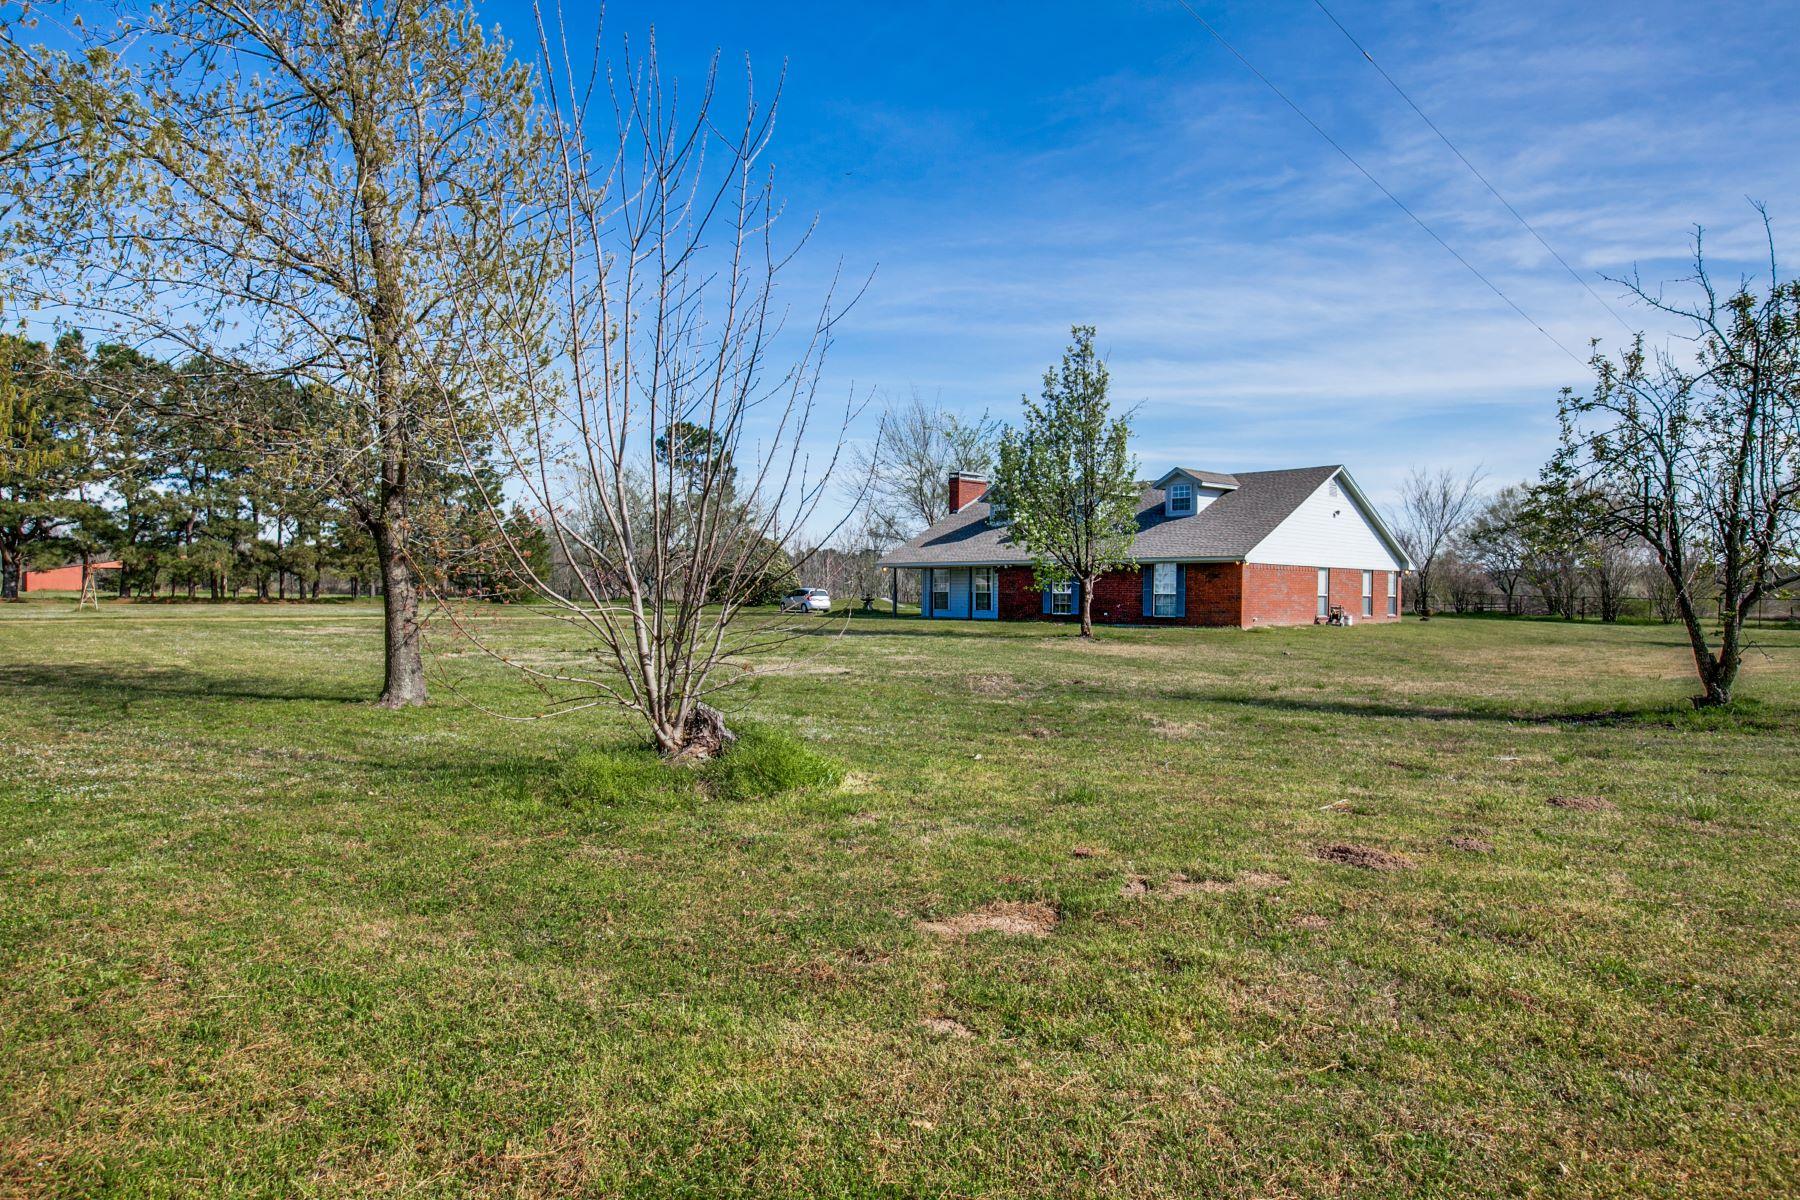 Farm / Ranch / Plantation for Sale at Grasslands Ranch 132 Acres 01 E. FM 273 Telephone, Texas 75488 United States